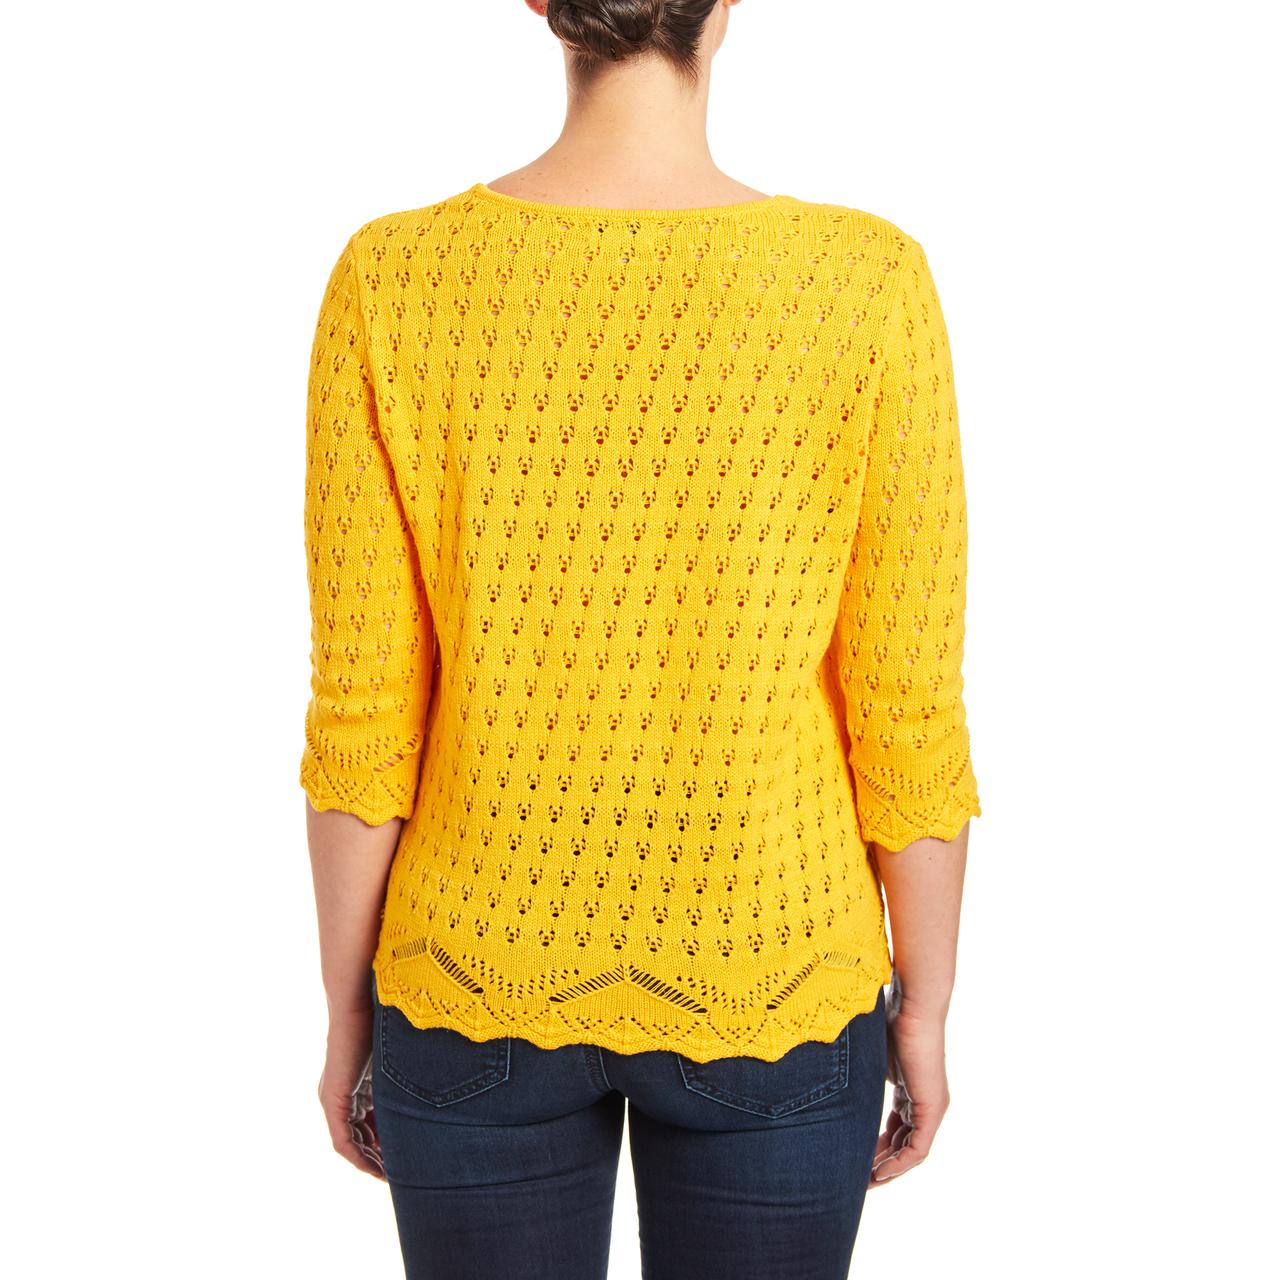 V-neck Open Stitch Knit Sweater in Daffodil